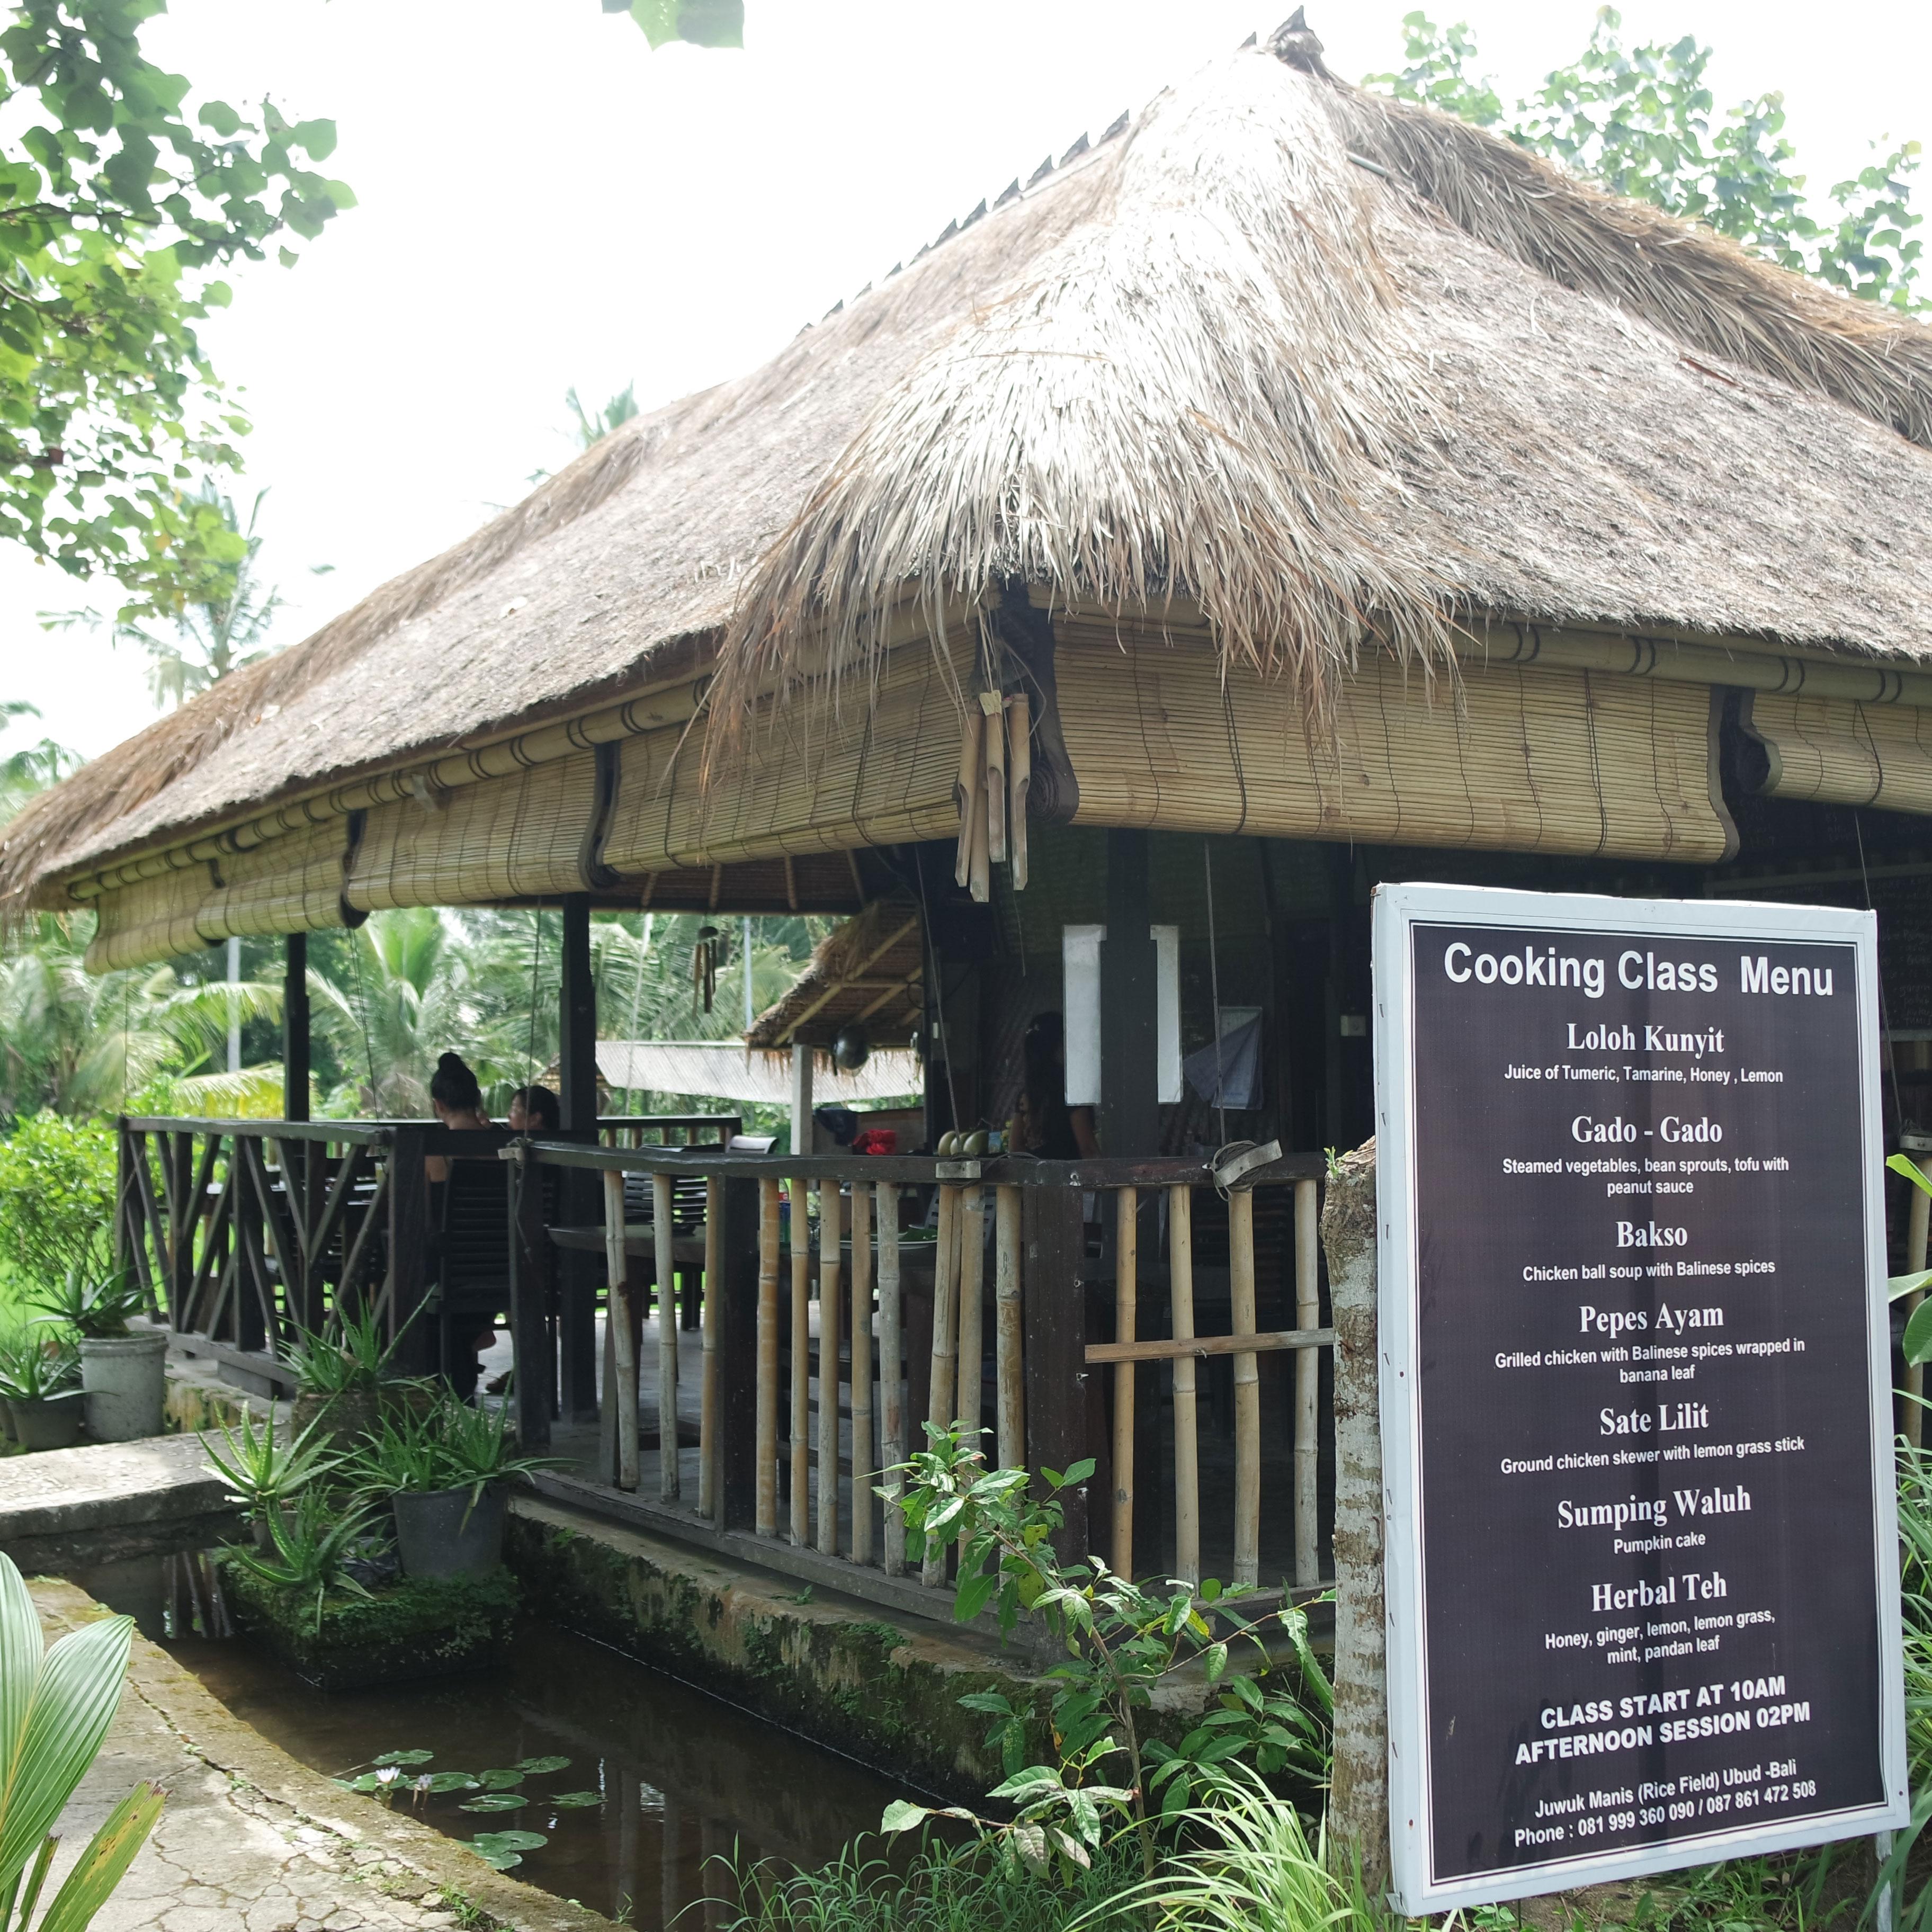 ubud-ricefield-bali-voyage-blog-restaurant-bon-pas-cher-avis